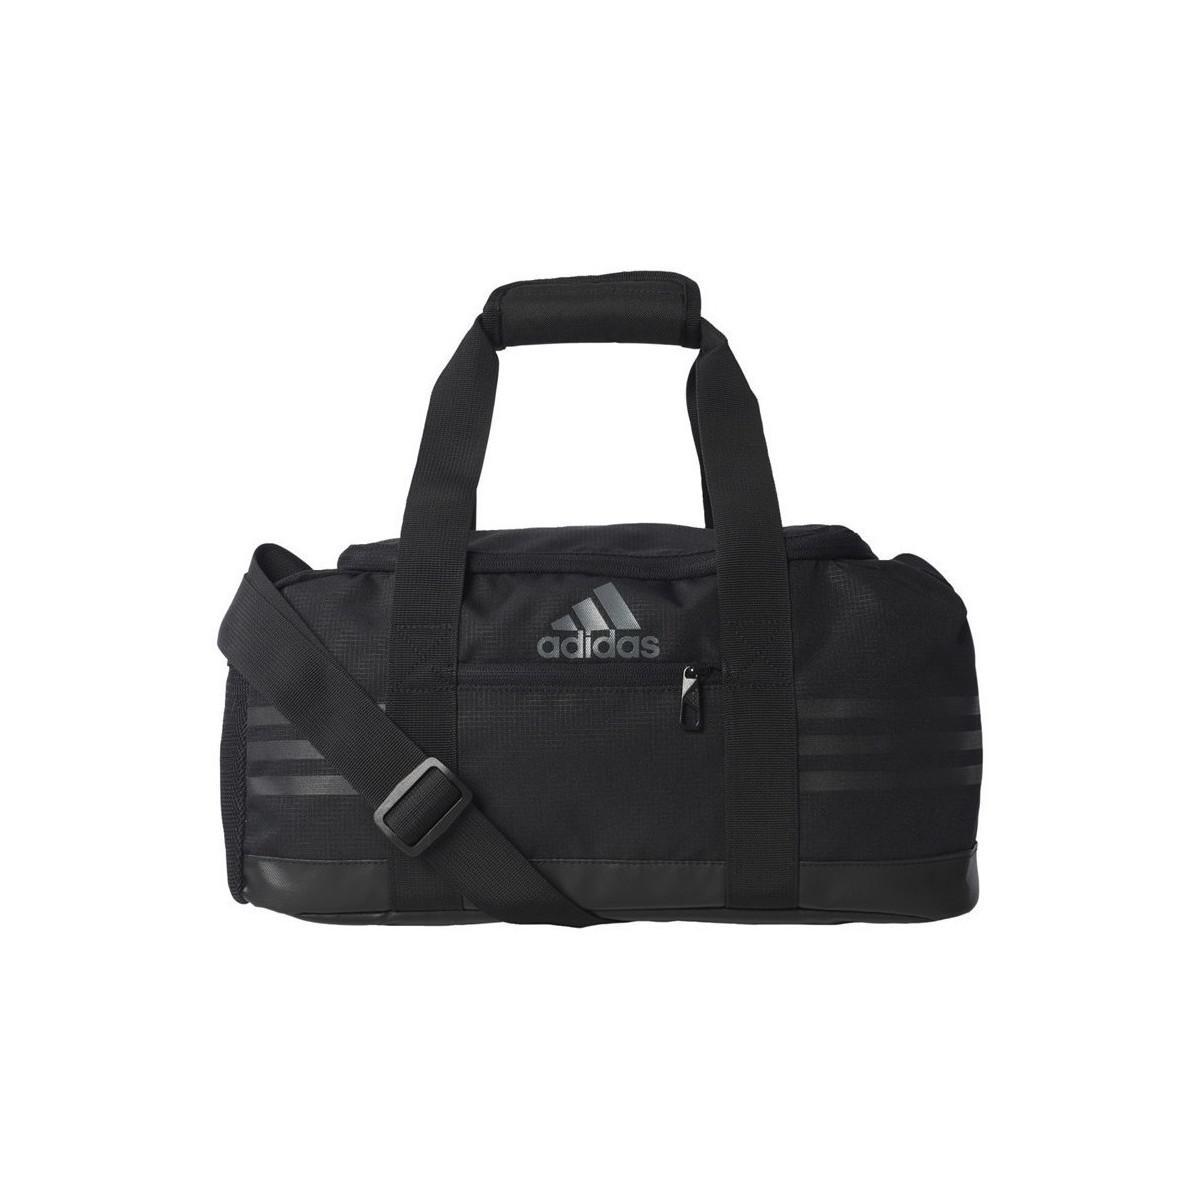 Adidas Originals 3stripes Performance Team Bag Xs Women s Sports Bag ... dce4a7e330d38